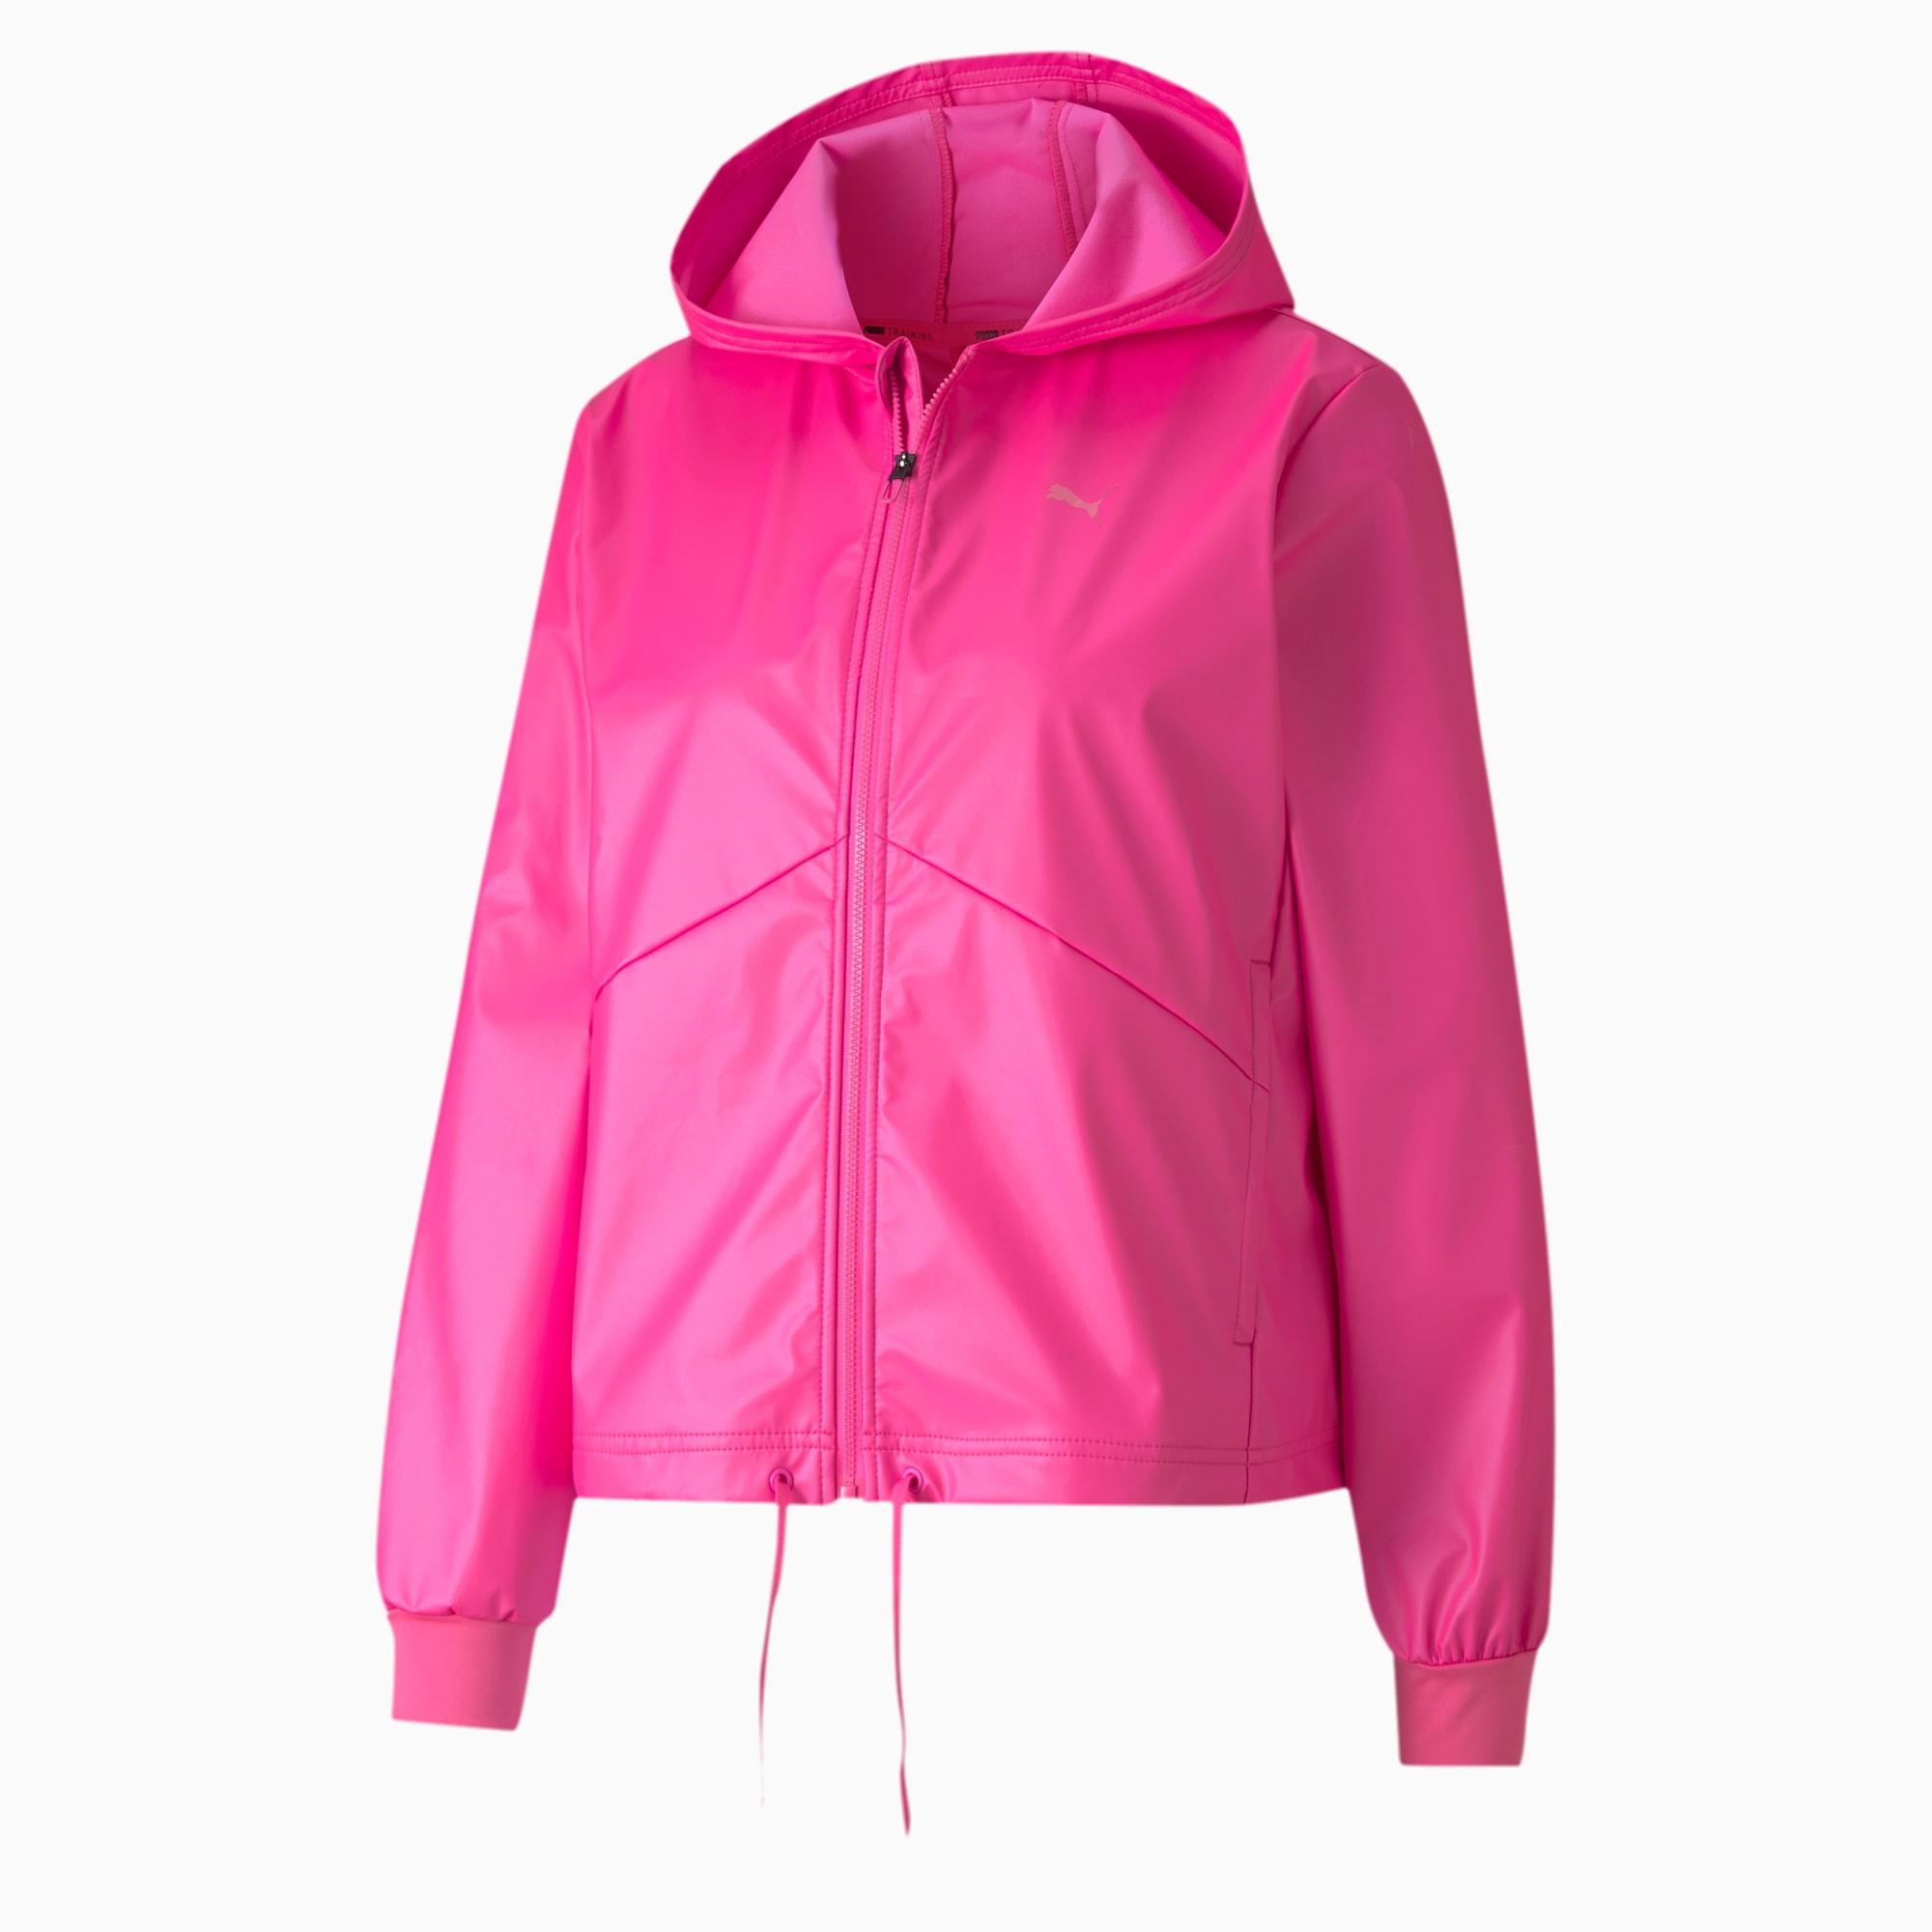 puma -  Warm-Up Shimmer Damen Trainingsjacke mit Kapuze | Mit Aucun | Rosa | Größe: XS